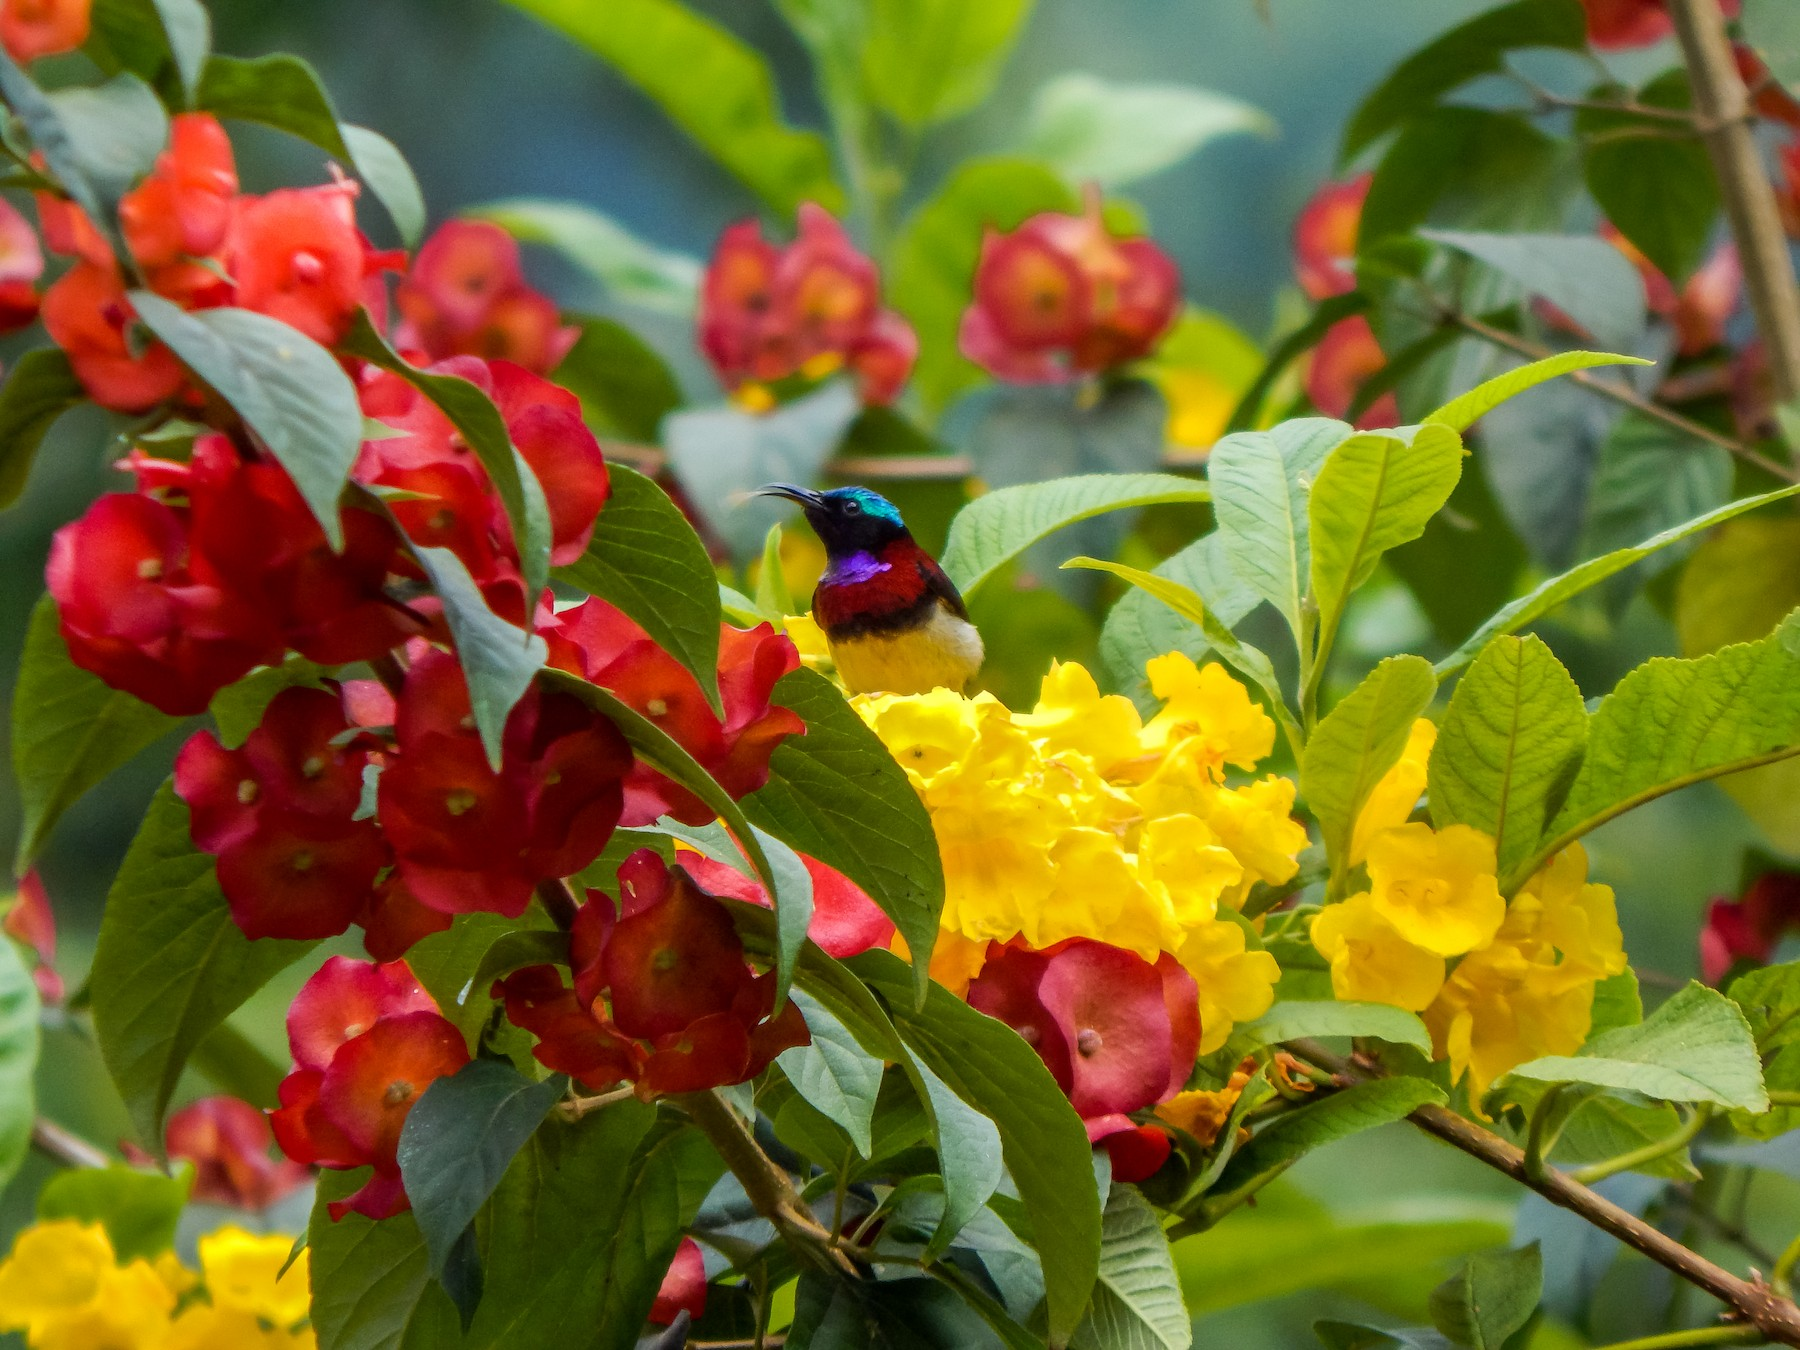 Crimson-backed Sunbird - Vinay K L